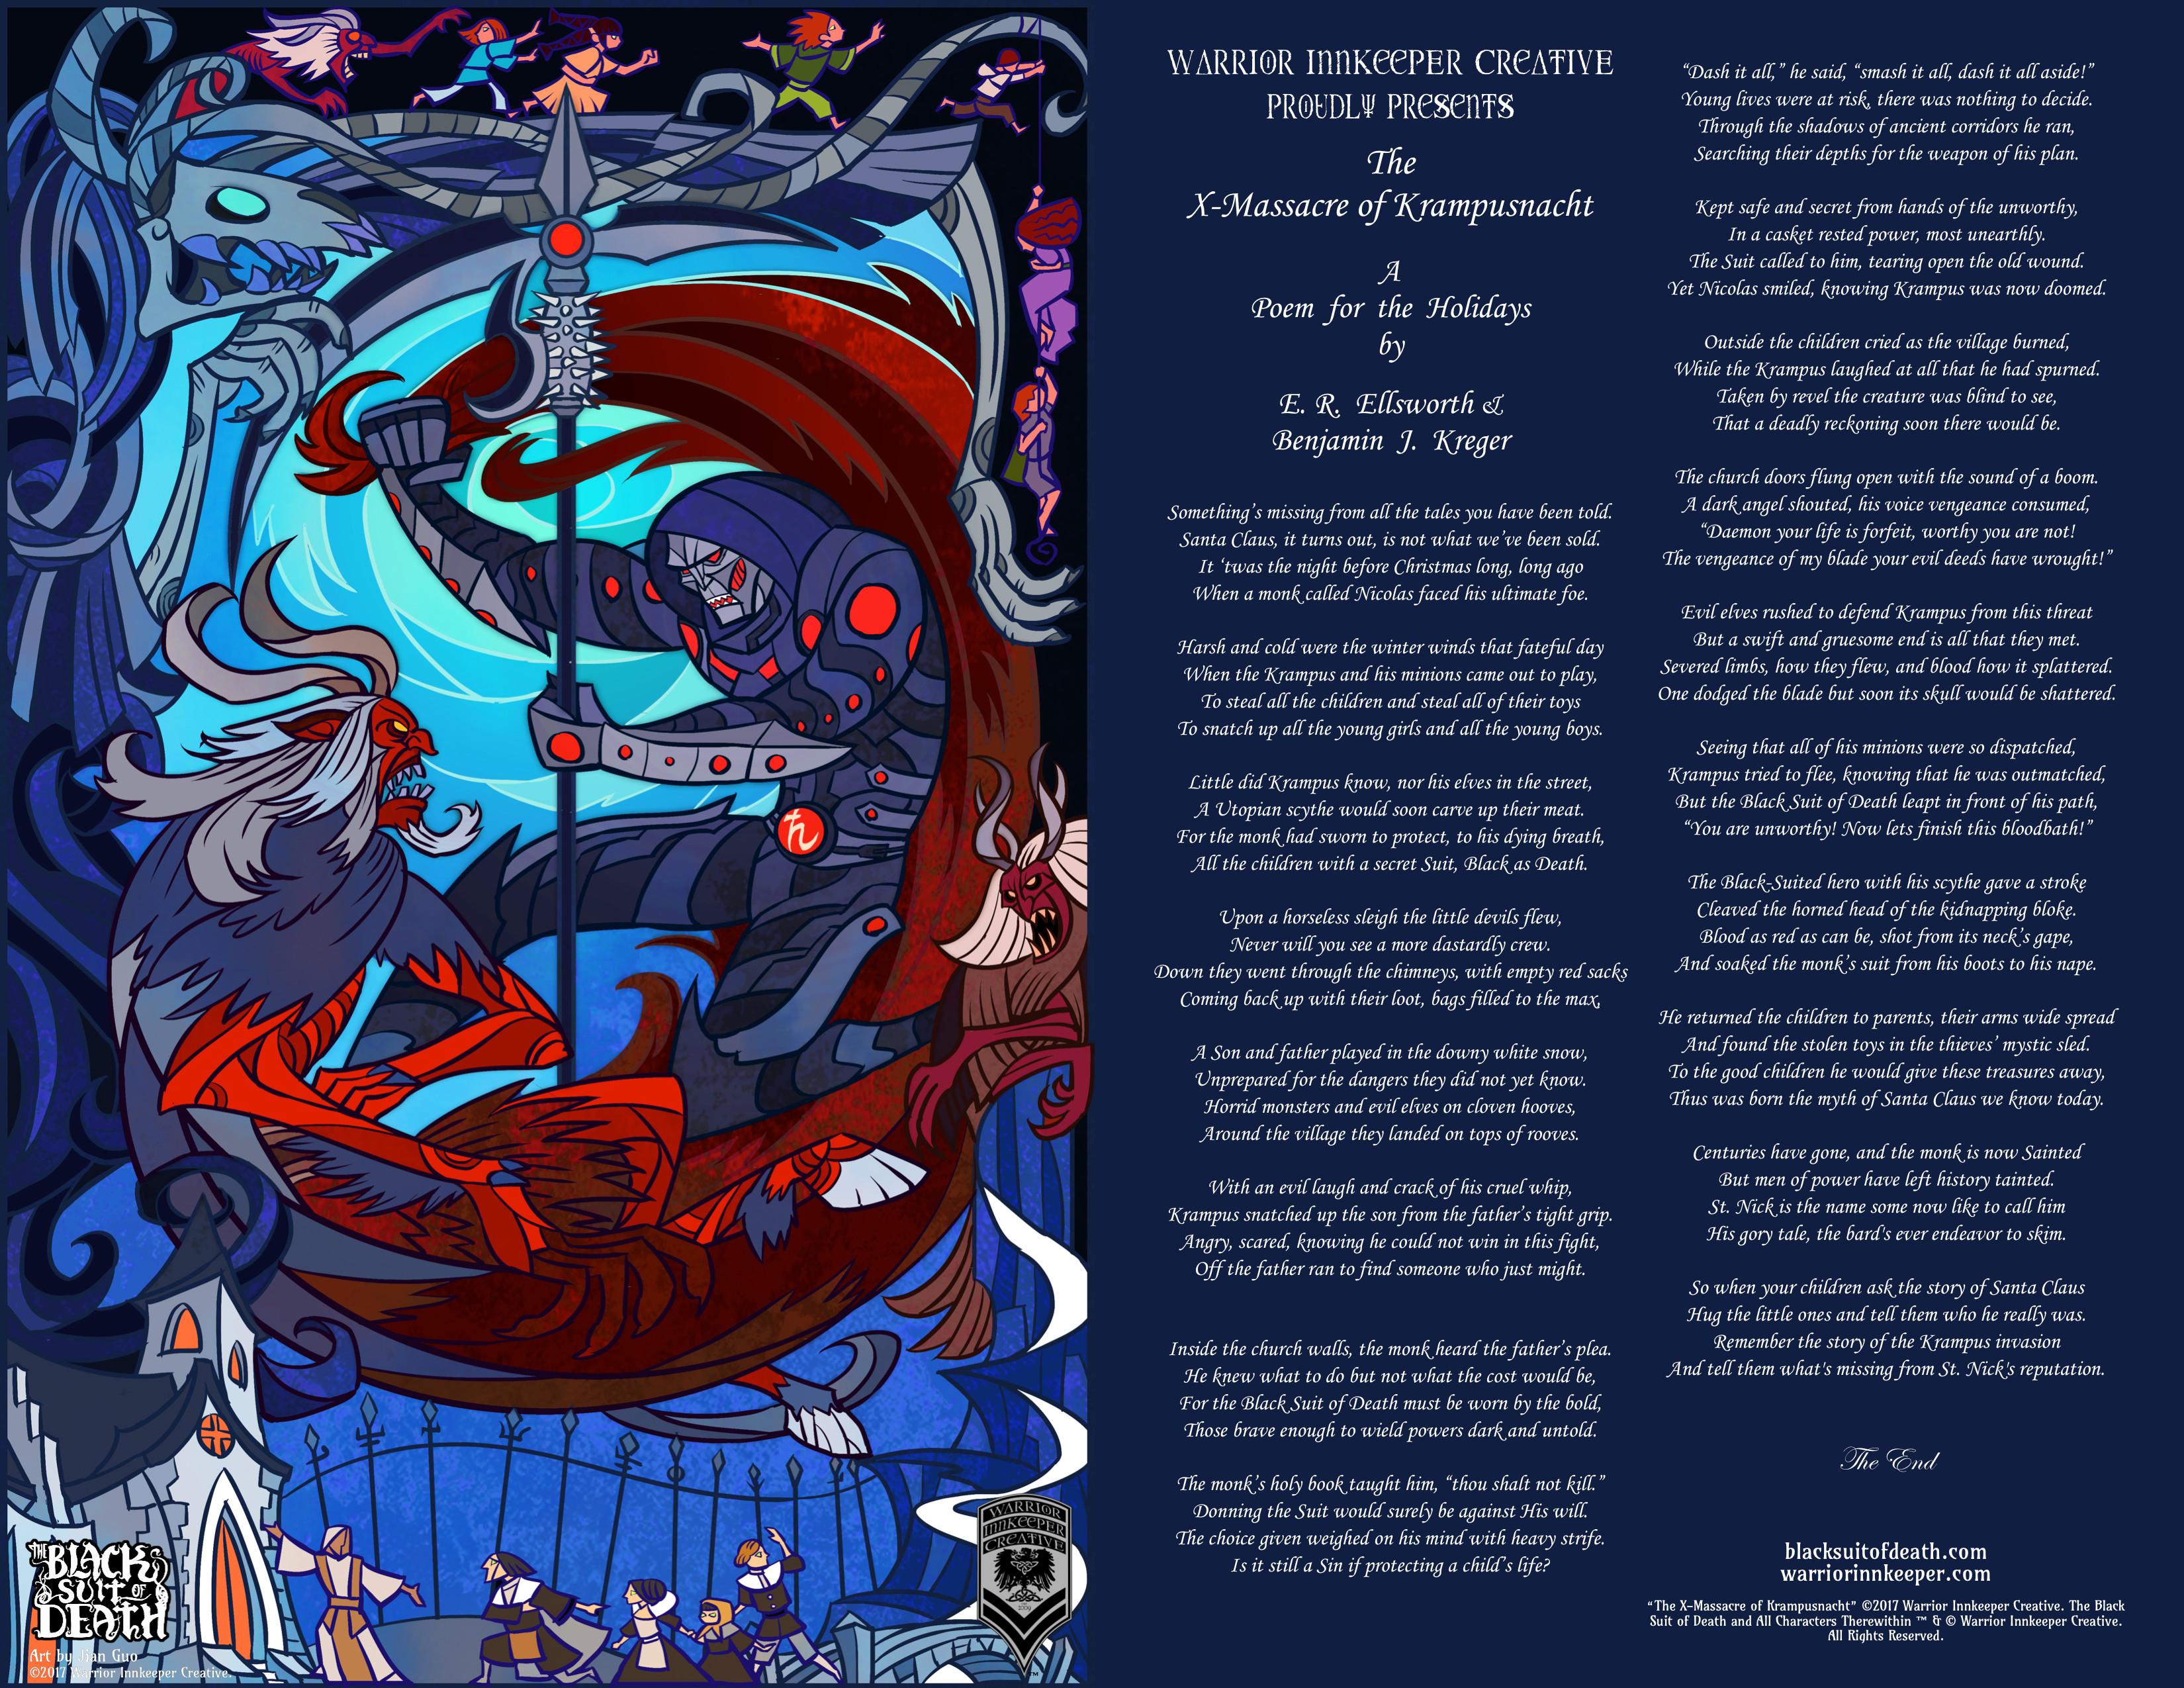 Evil Christmas Characters.X Mas Sacre A Bsd Holiday Poem Black Suit Of Death Blog